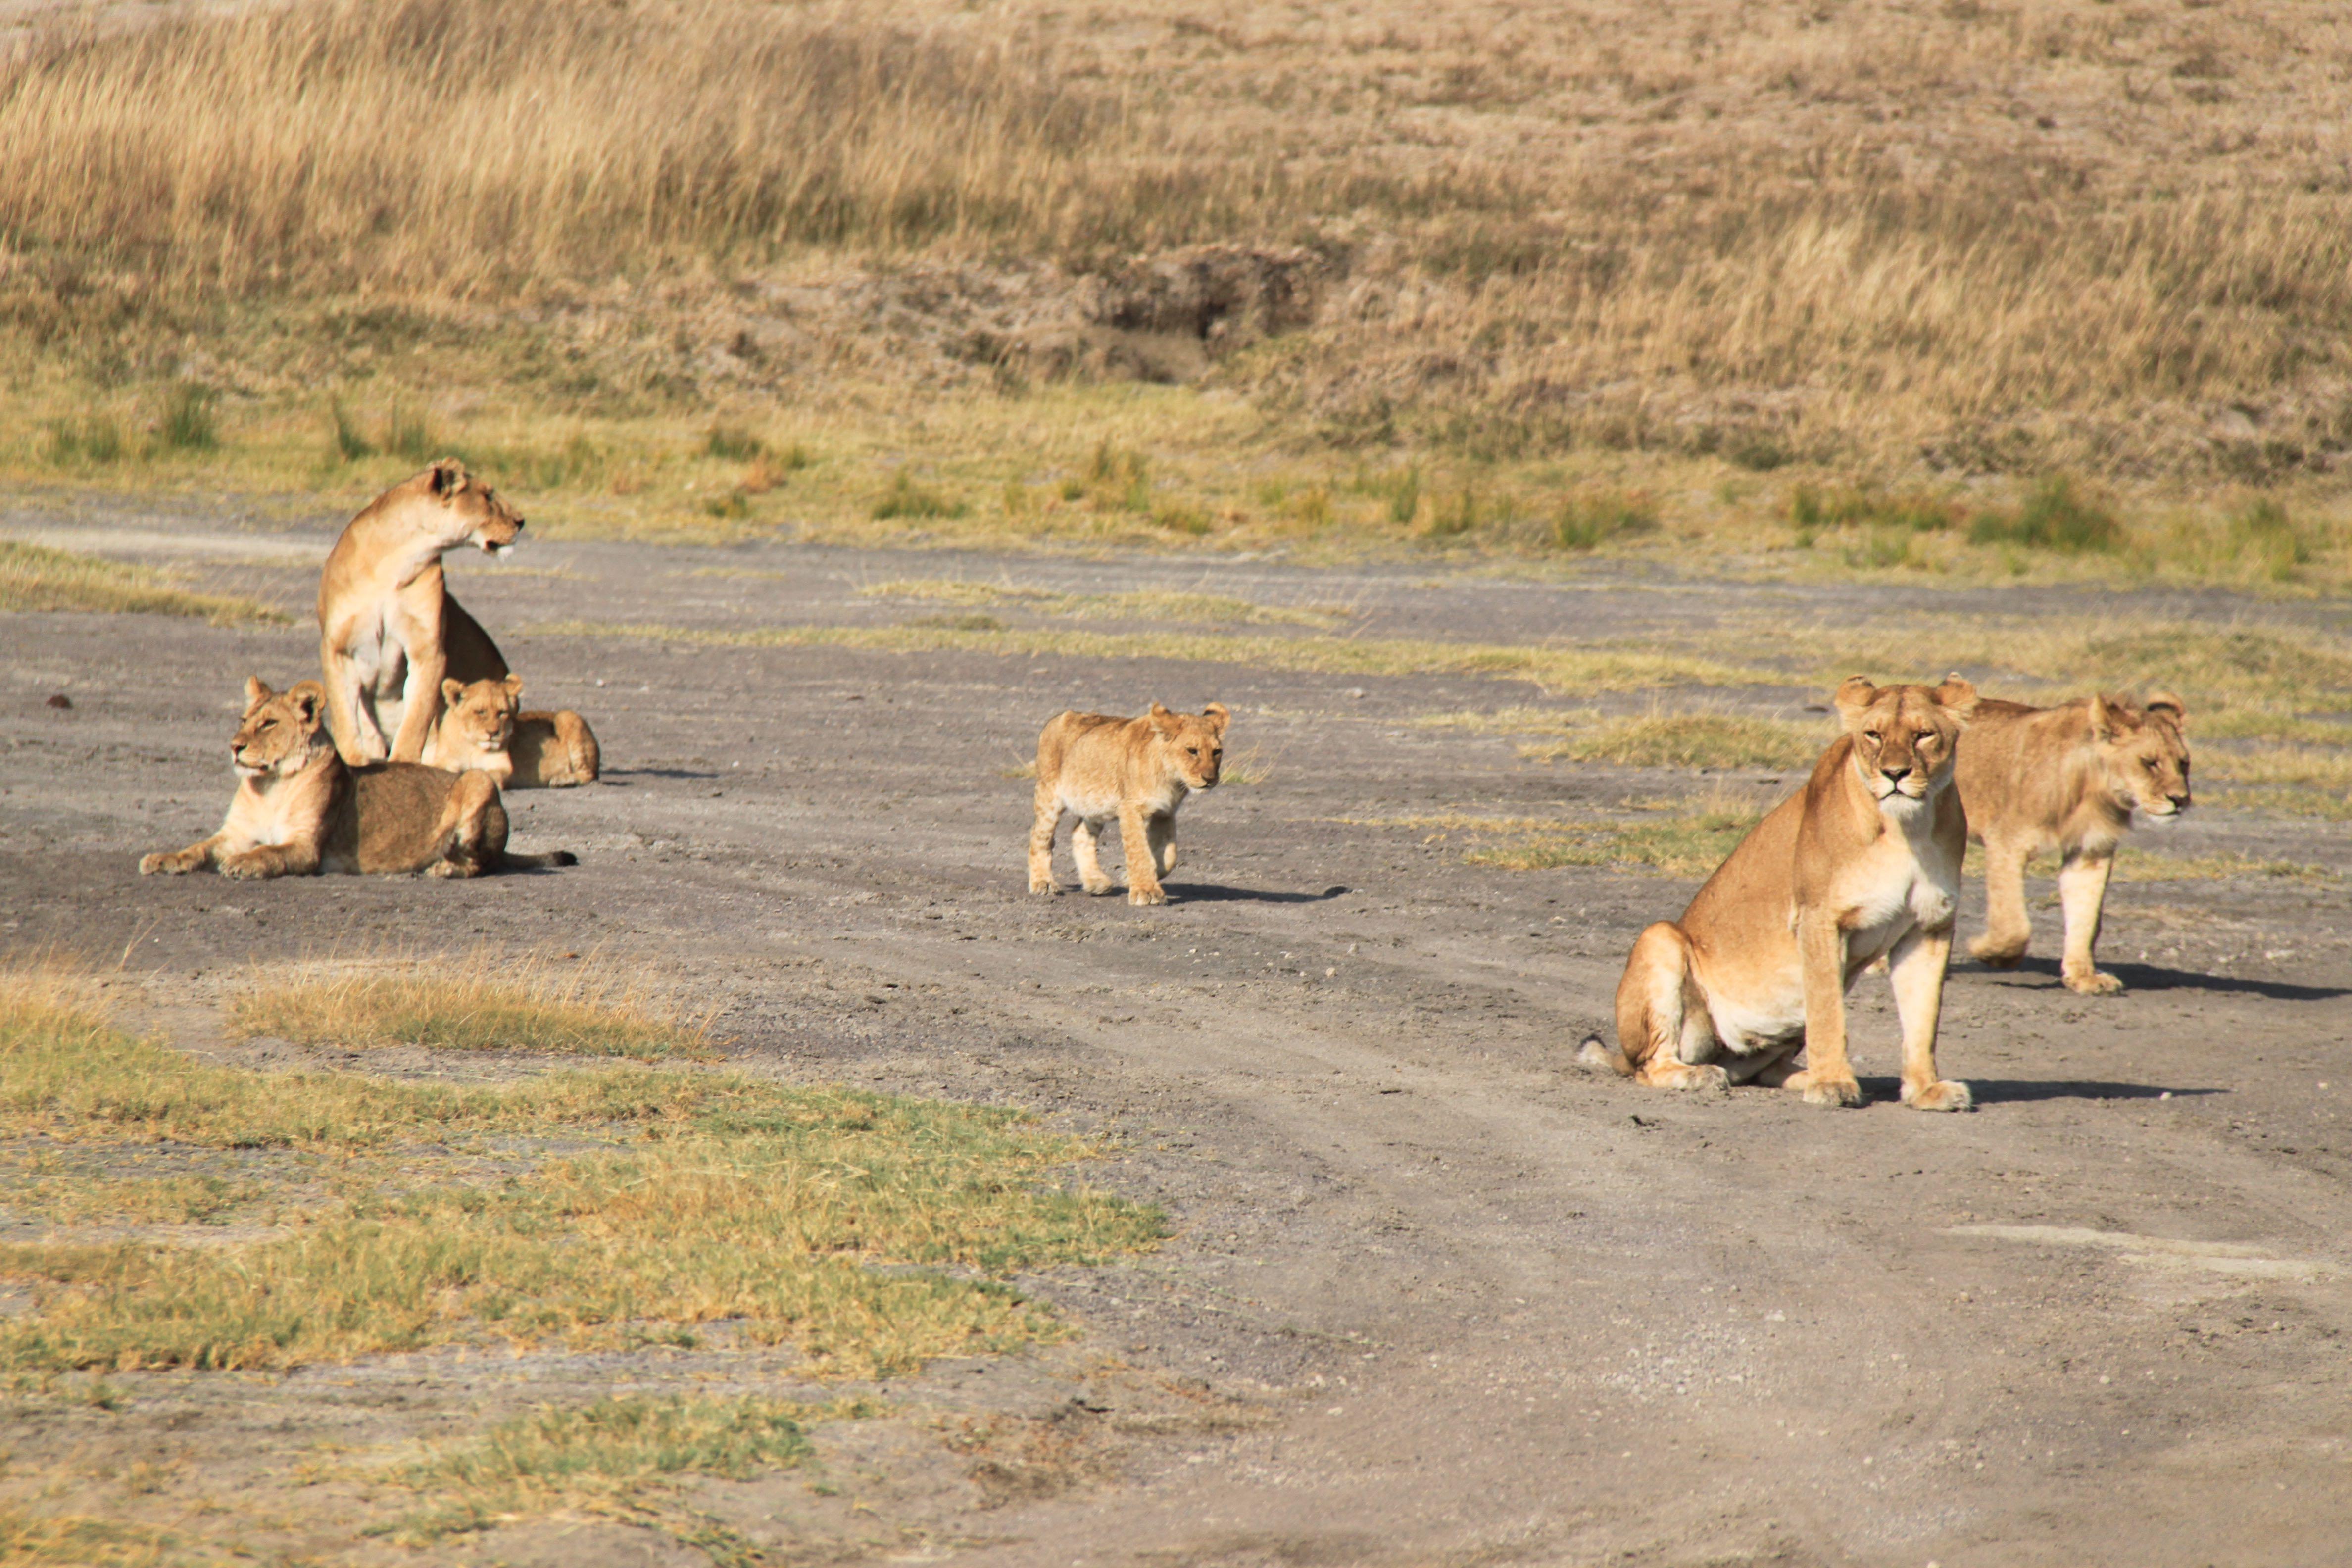 Early morning safari in Serengeti National Park Tanzania